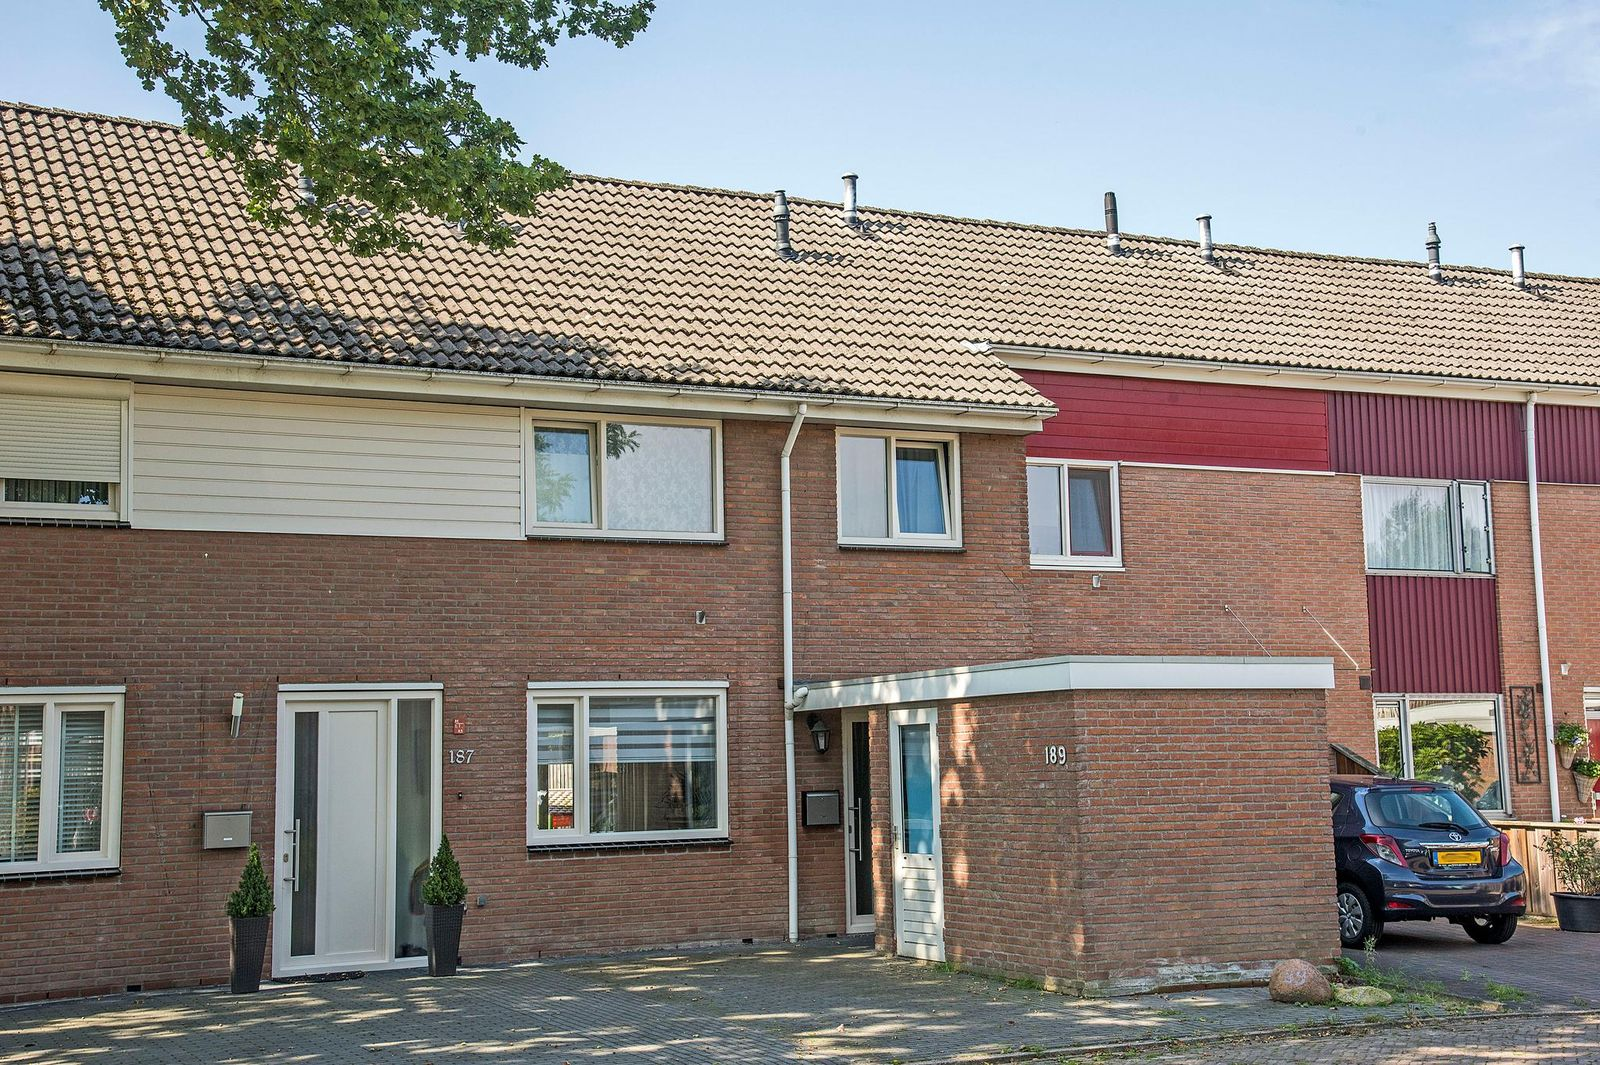 Holtwiklanden 189, Enschede